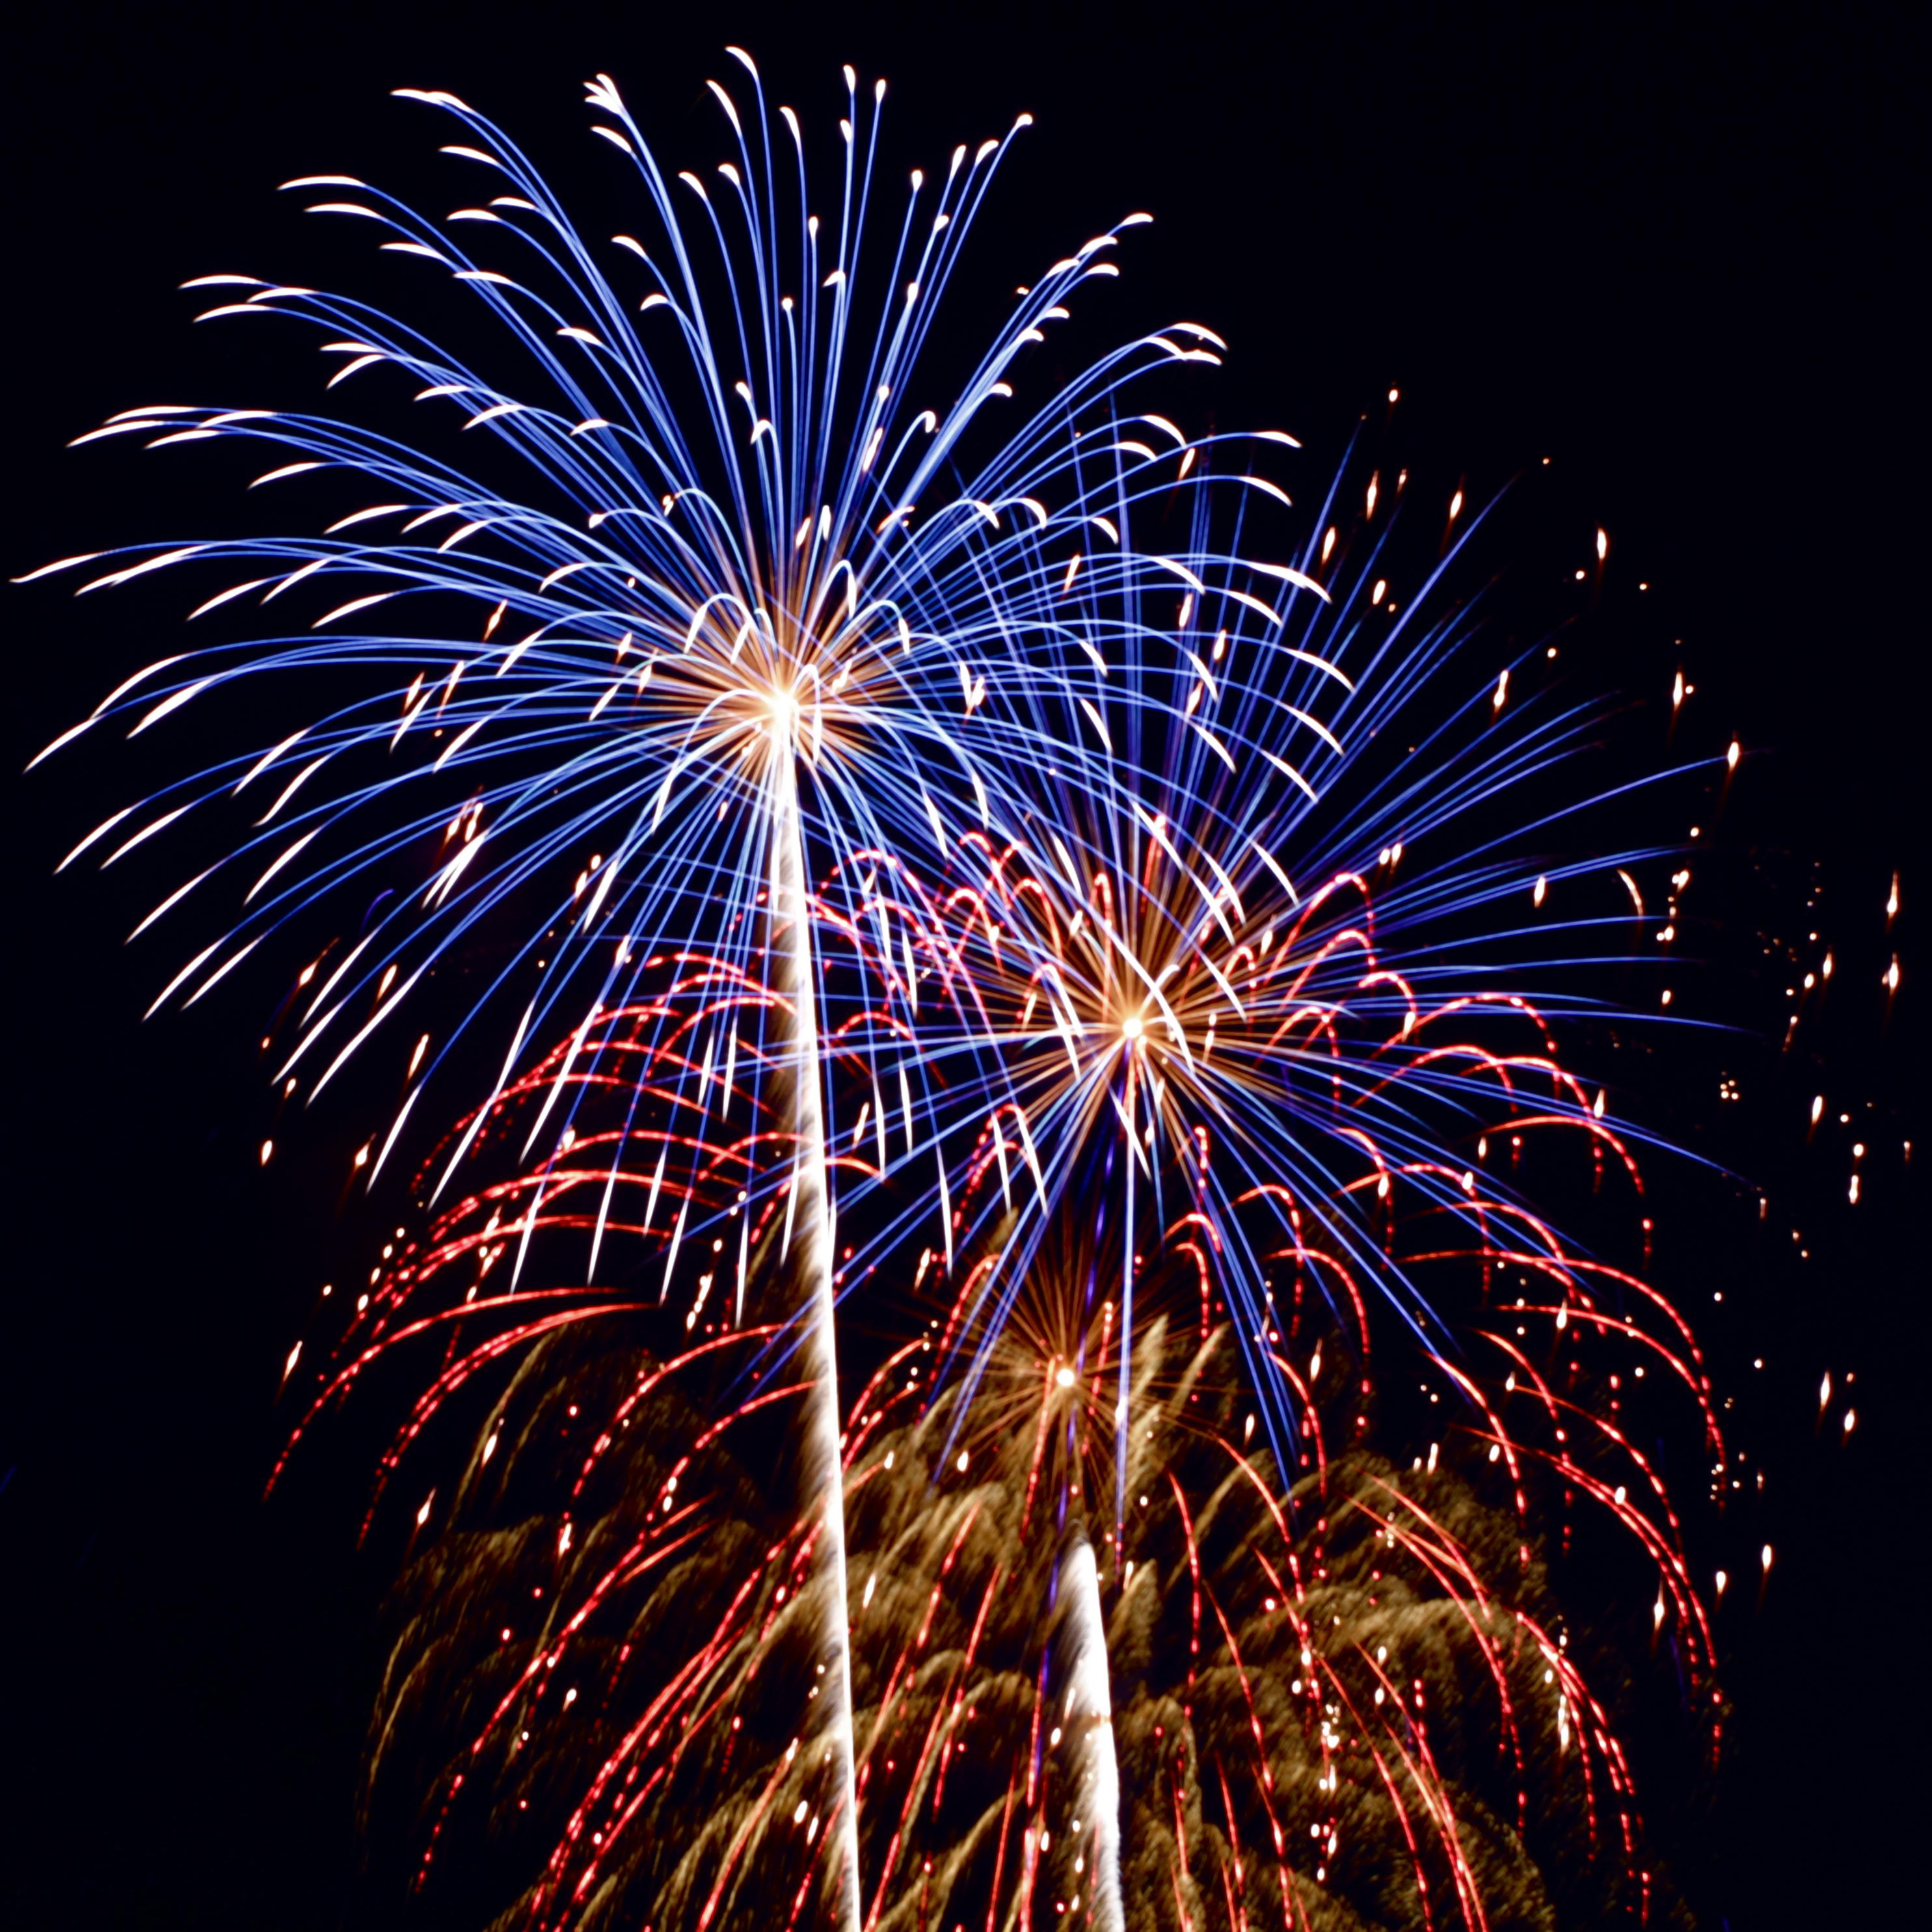 Fireworks_8159